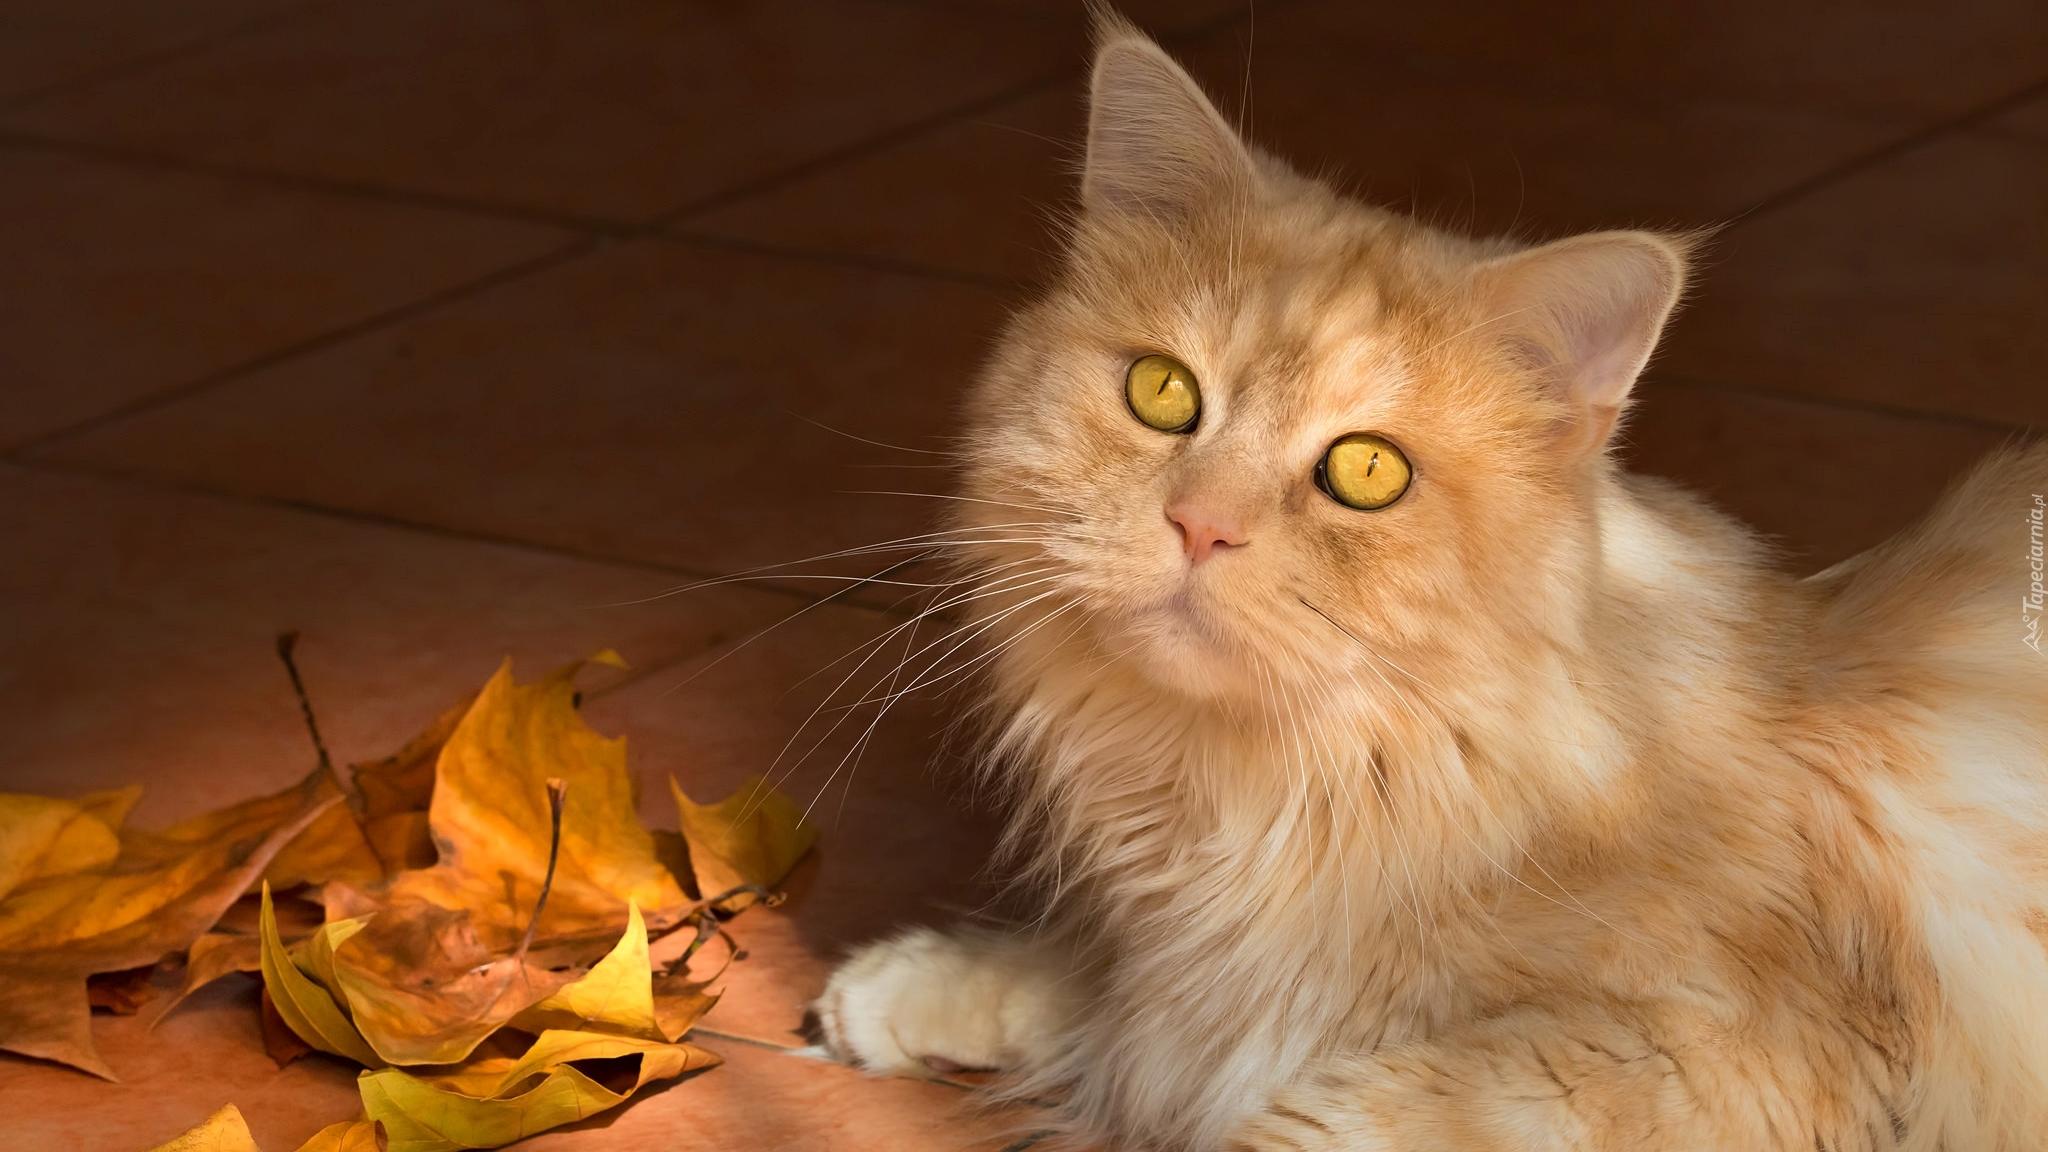 Rudy Kot Obok Liści